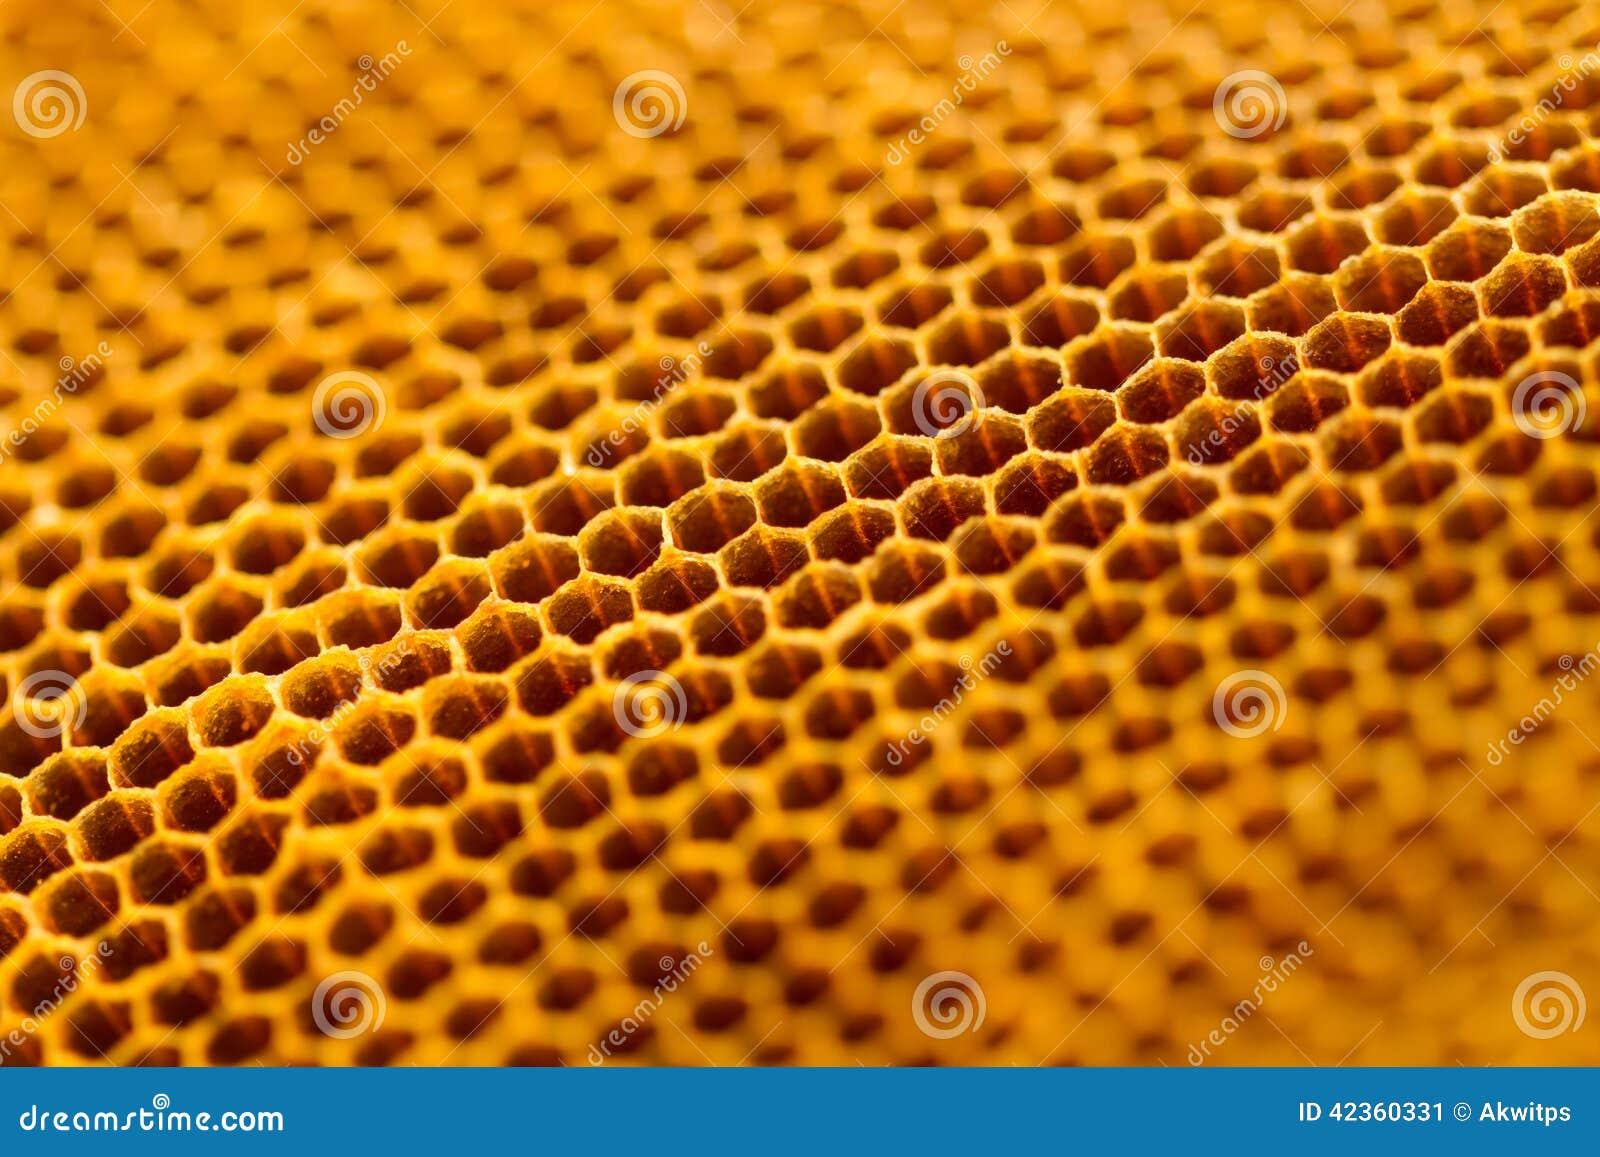 Raw honey texture